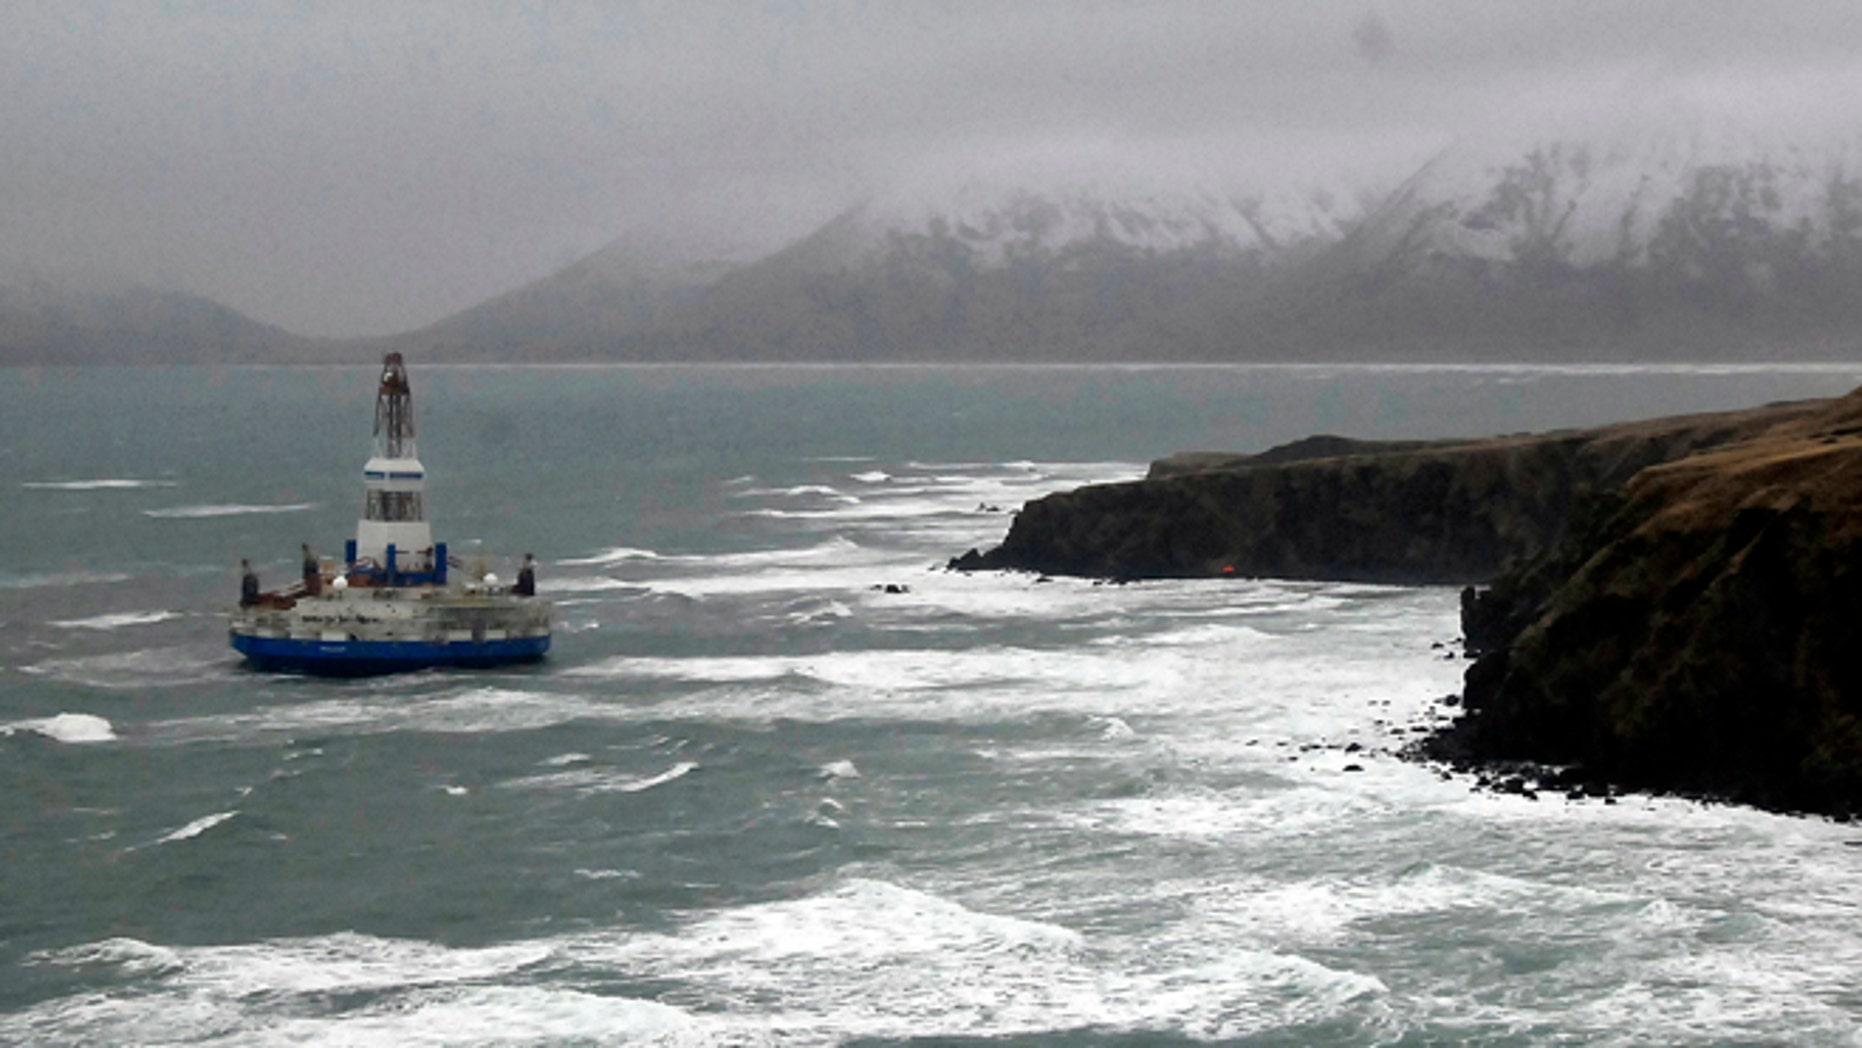 Jan. 2: Royal Dutch Shell drilling rig Kulluk aground off a small island near Kodiak Island